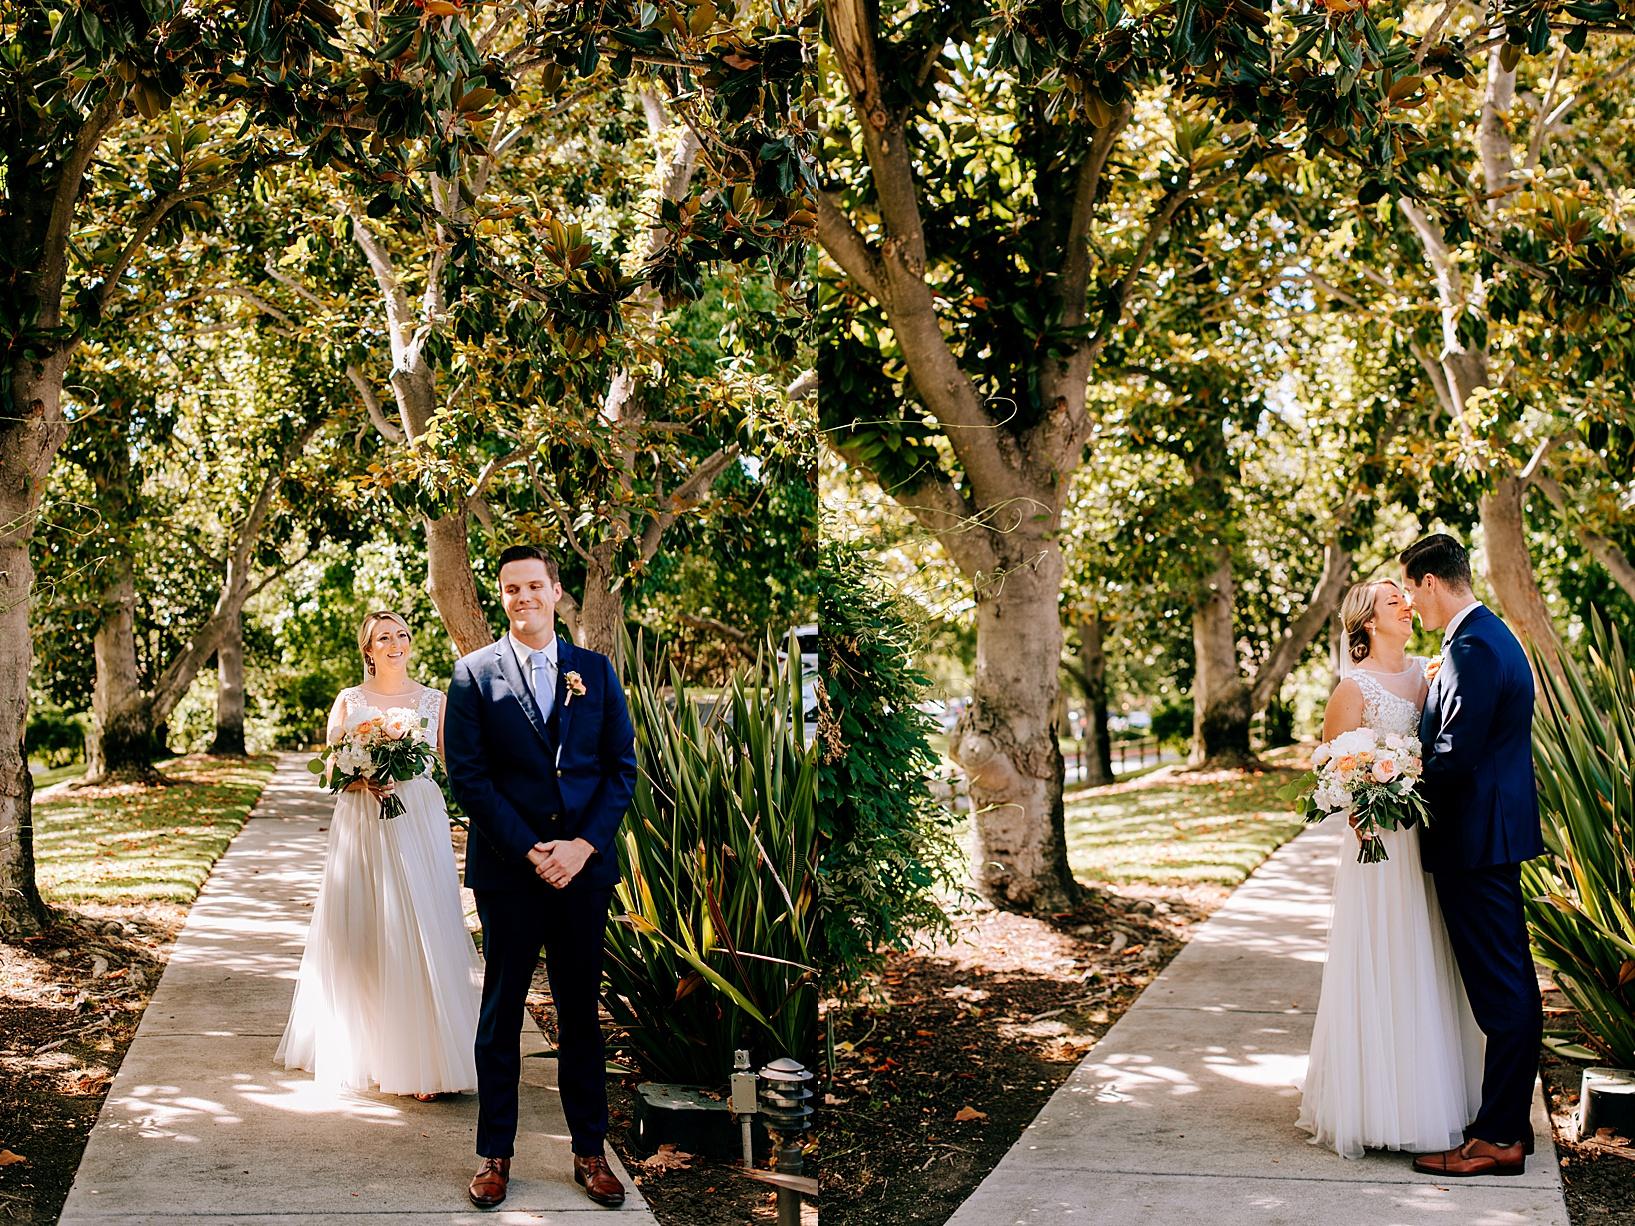 First look for Temecula wedding at Temecula Creek Inn